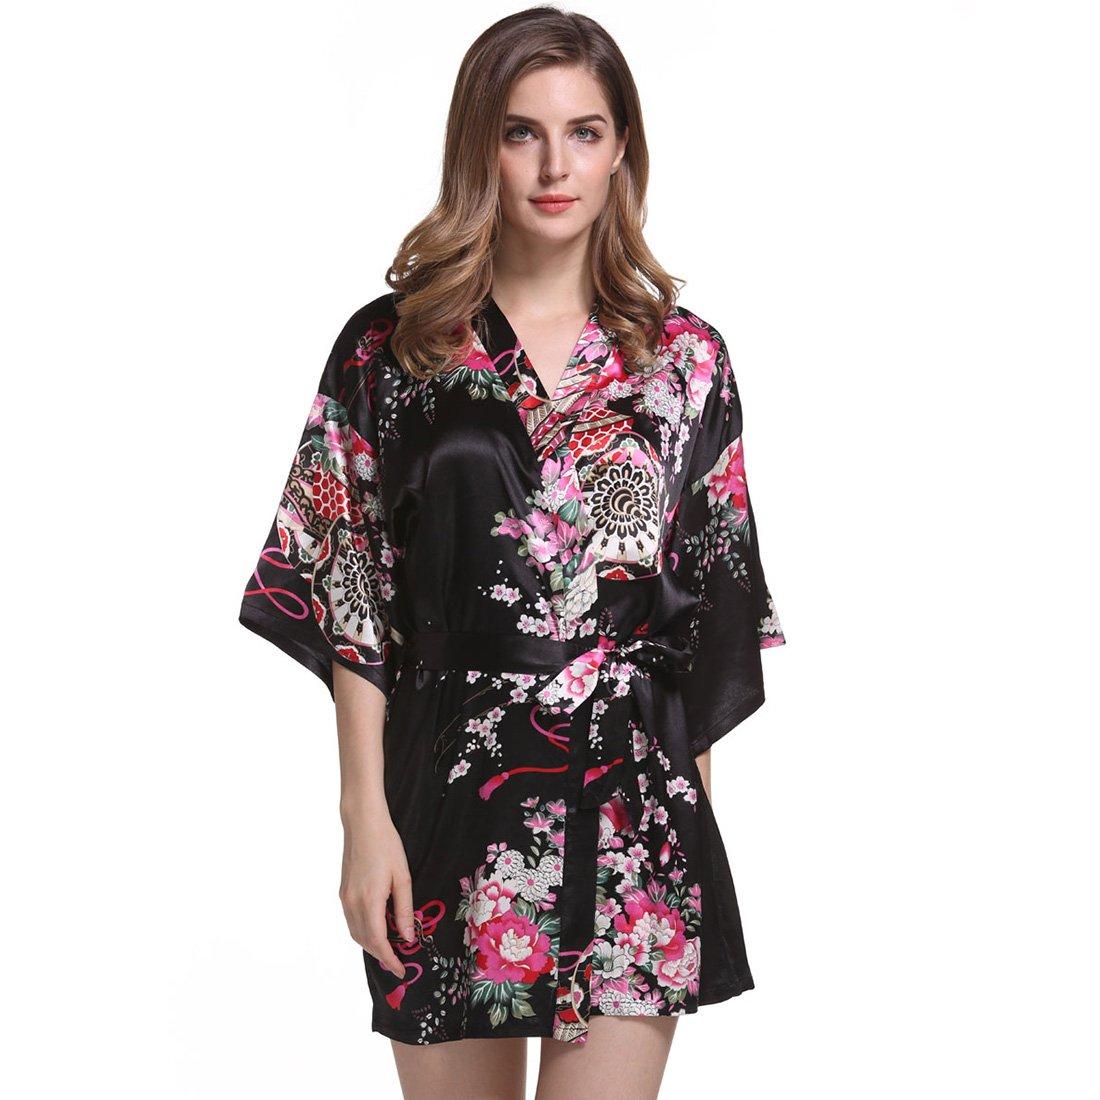 4fef04d2f Silkgrace Women's Elegant Flower Printing Kimono Robe Satin Short Sleeve  Sleepwear (XL, Black)